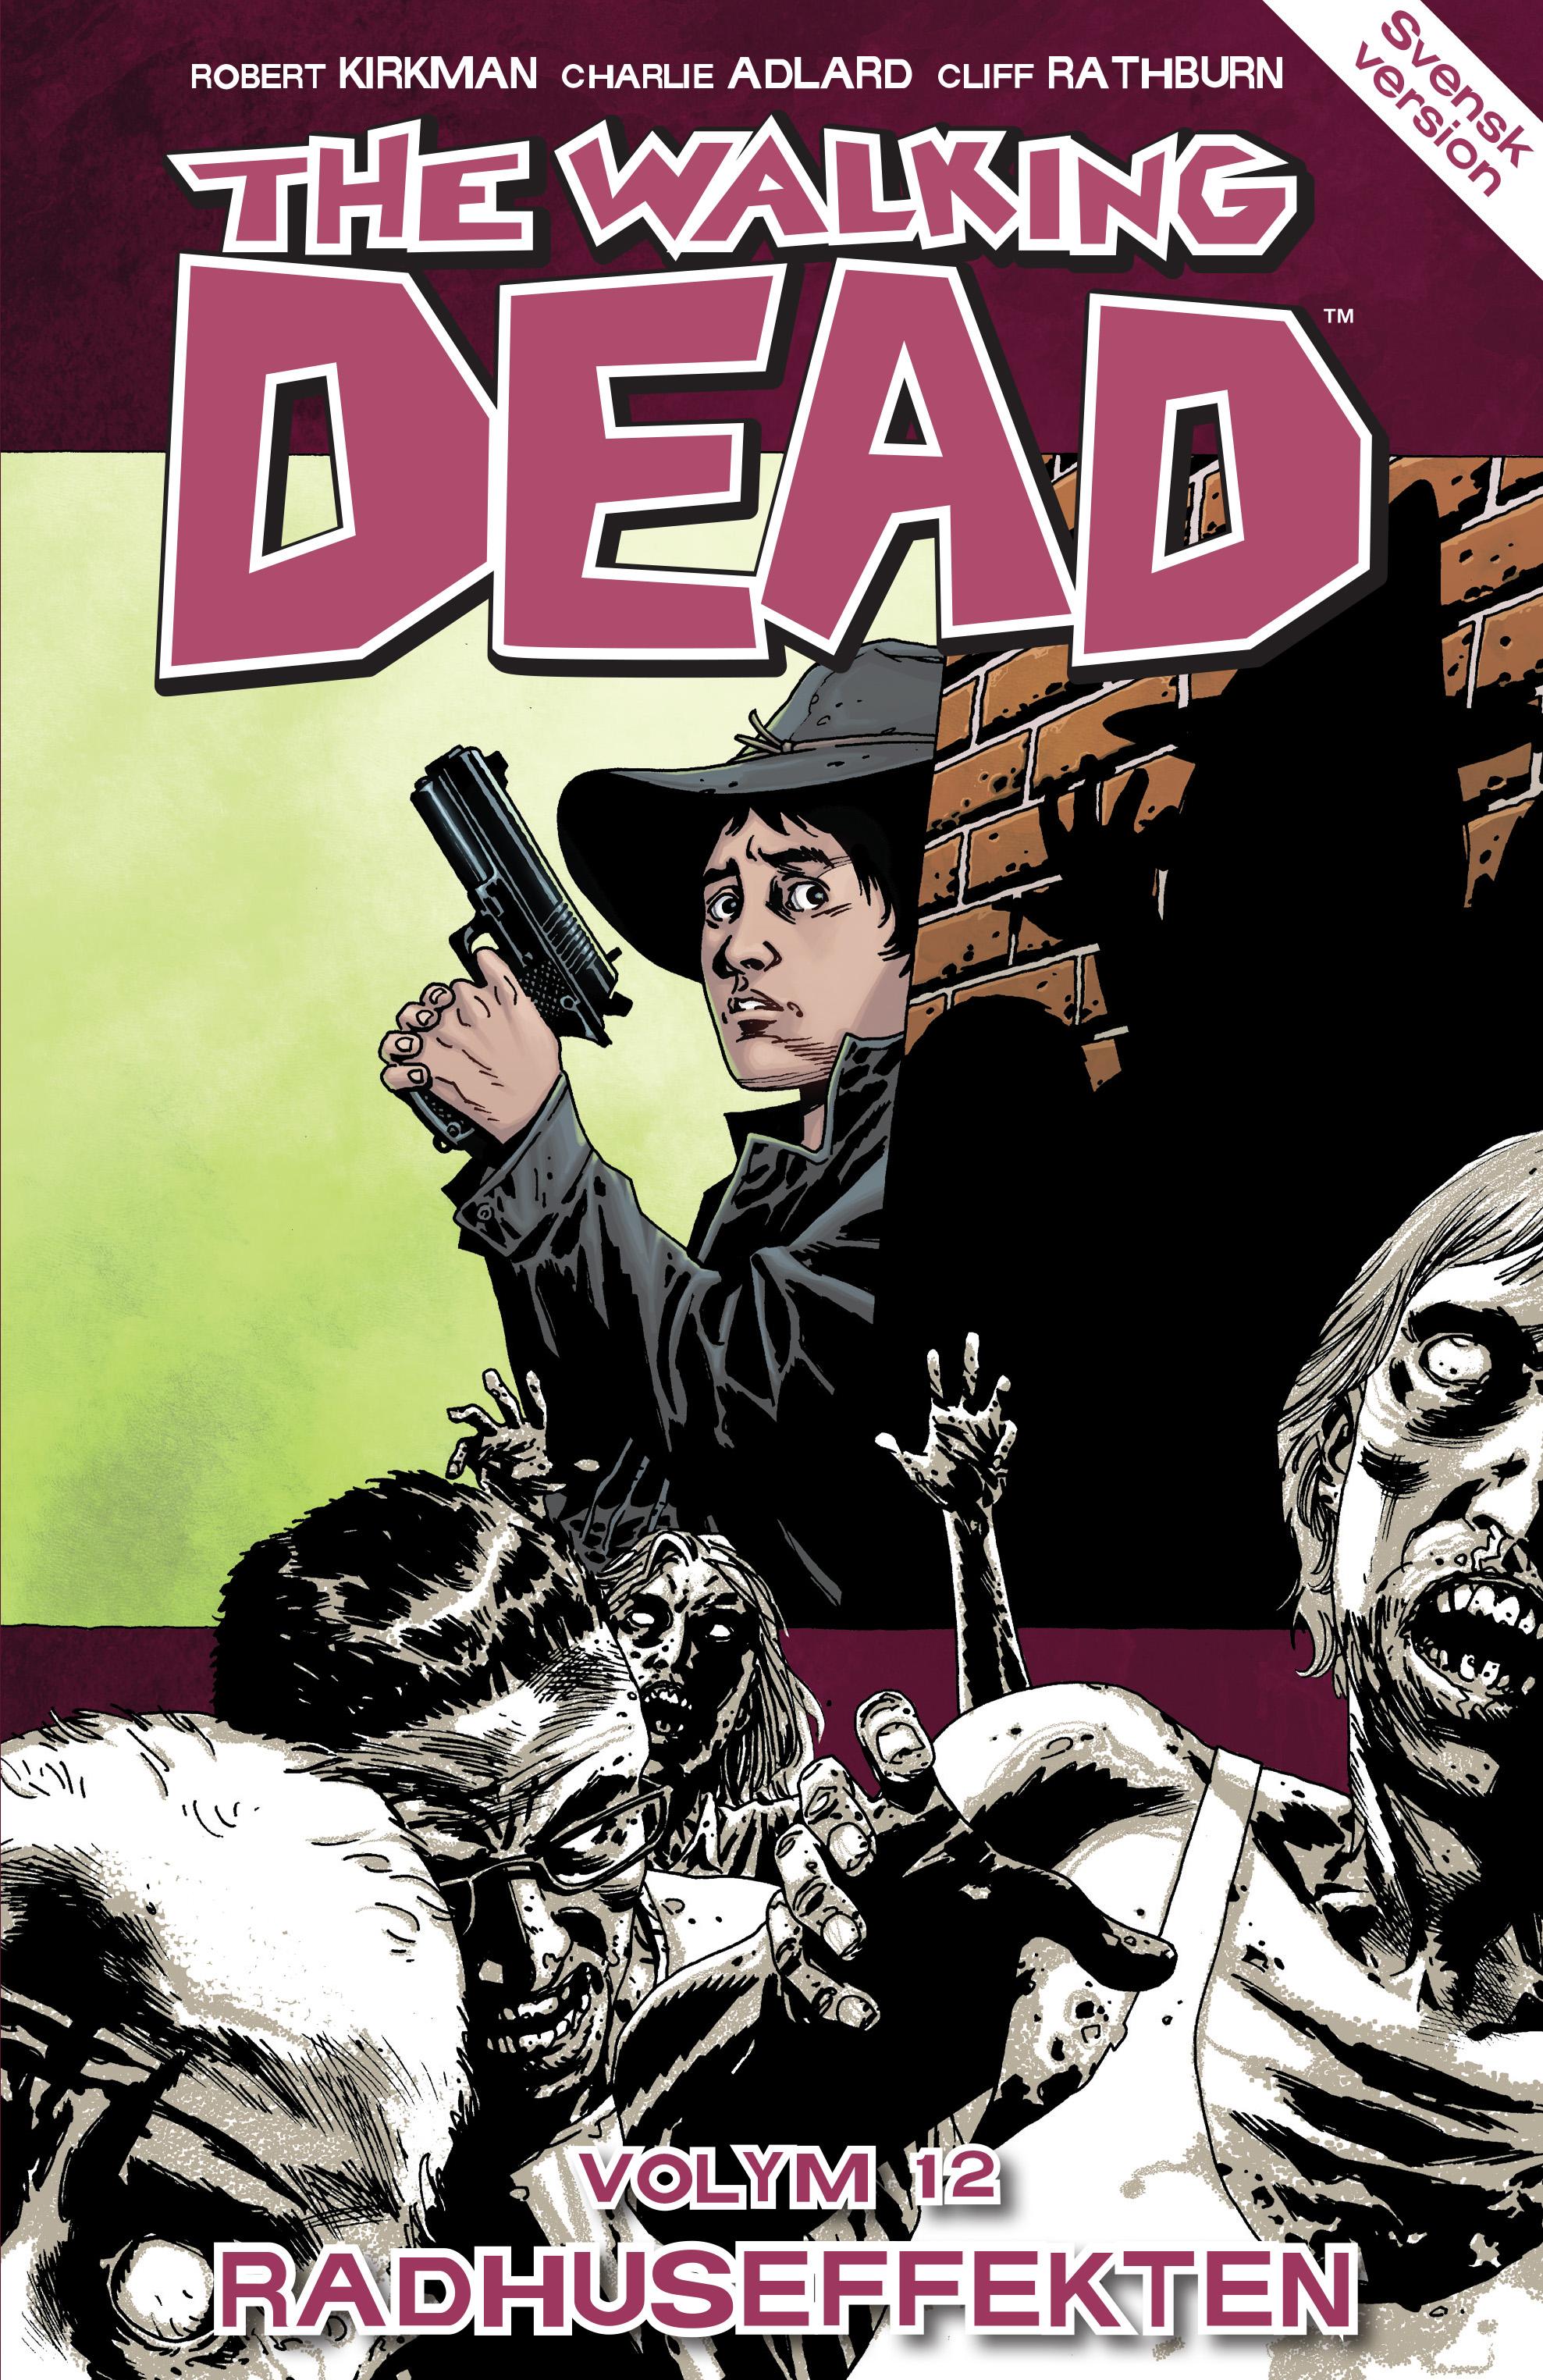 The Walking Dead volym 12. Radhuseffekten av Robert Kirkman